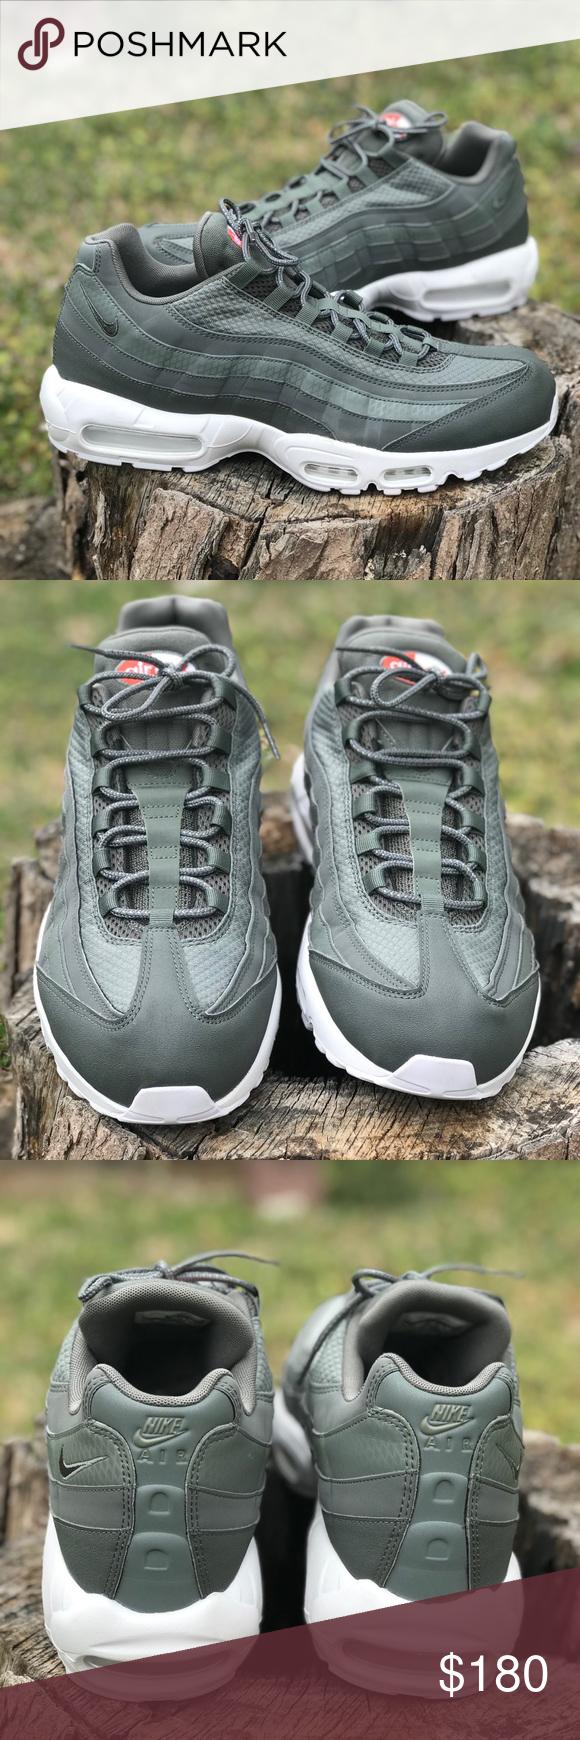 adadb91278 Nike Air Max 95 Premium SE NWOT River Rock & White Trainers 924478 002 Nike  Shoes Sneakers